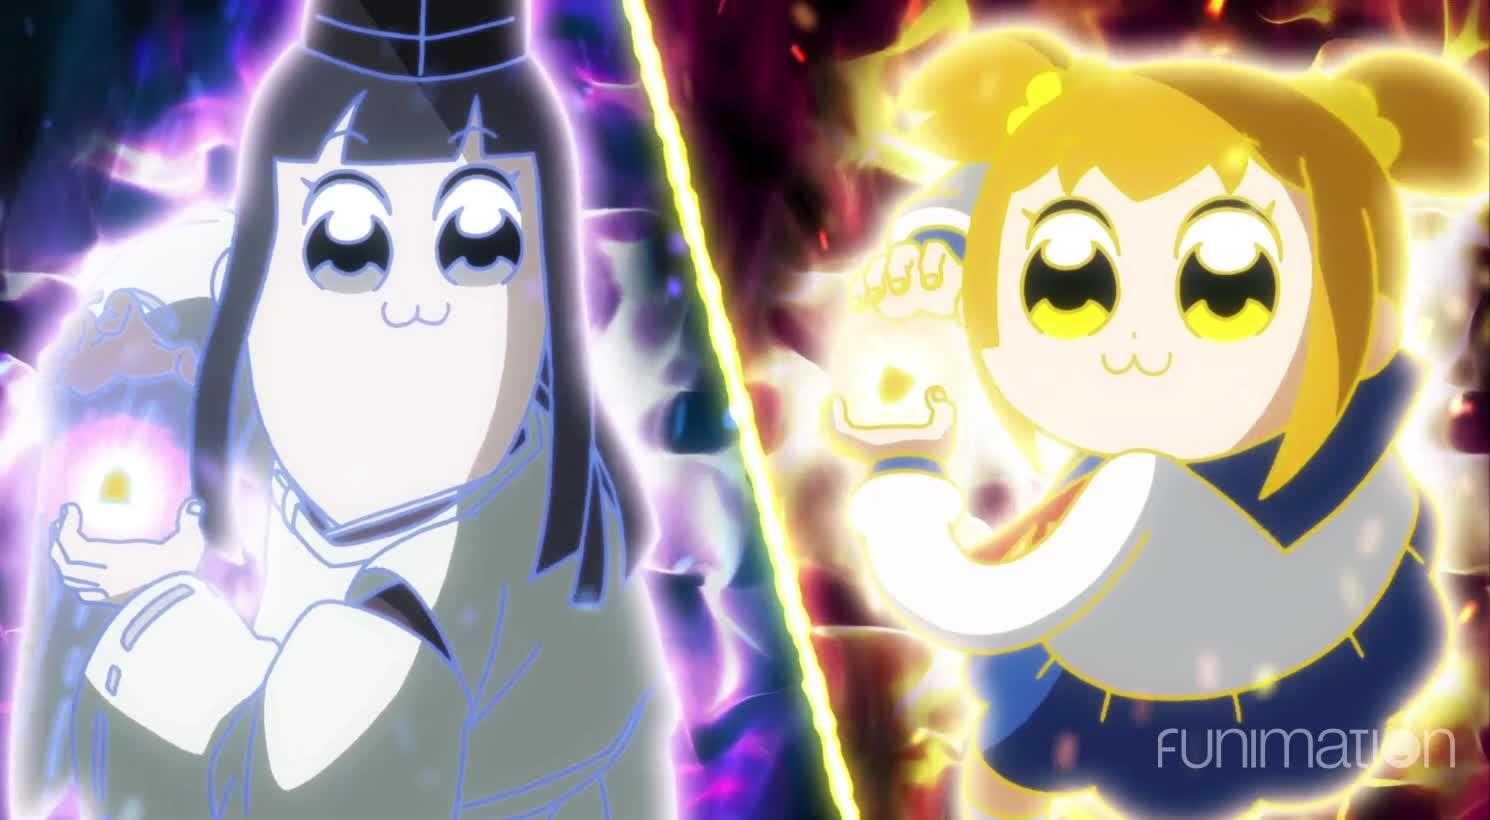 anime, cartoon, comedy, funimation, funny, pop team epic, pop team epic episode 6, Ka me ha... i mean Engery blasts! GIFs